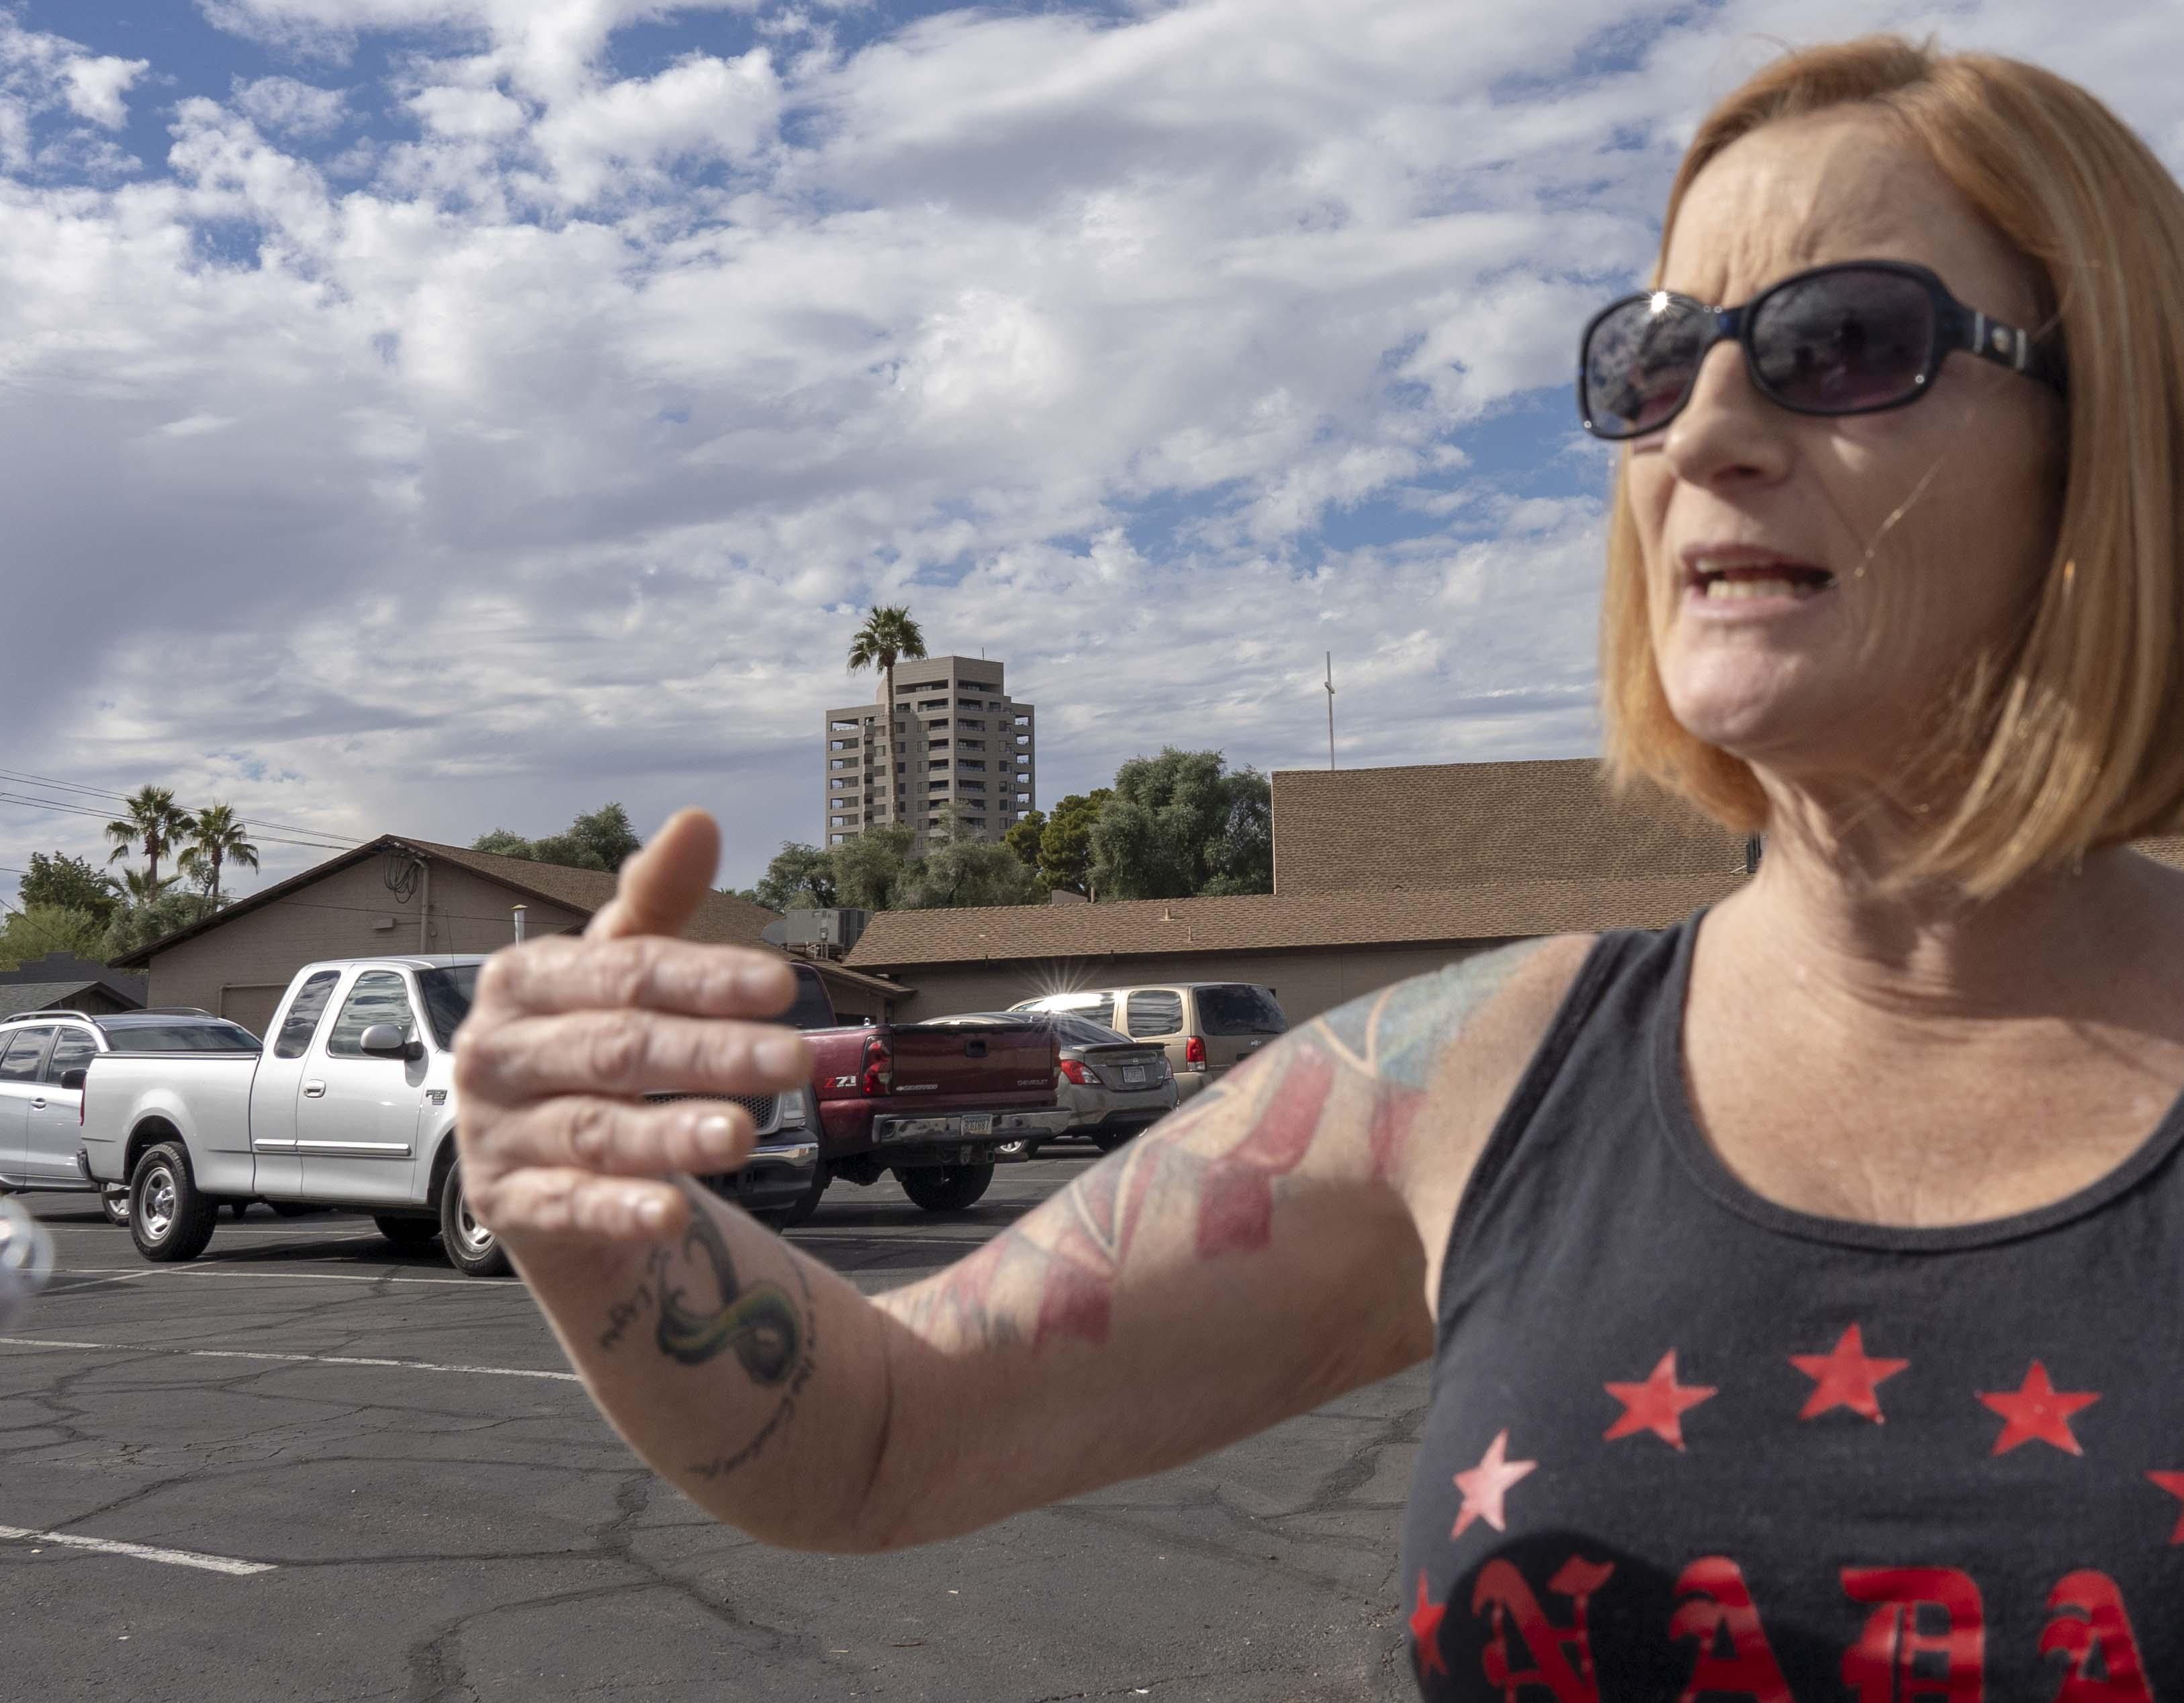 Lesa Antone, of the Patriot Movement AZ, protests outside a Phoenix-area church on Jan. 10, 2019.